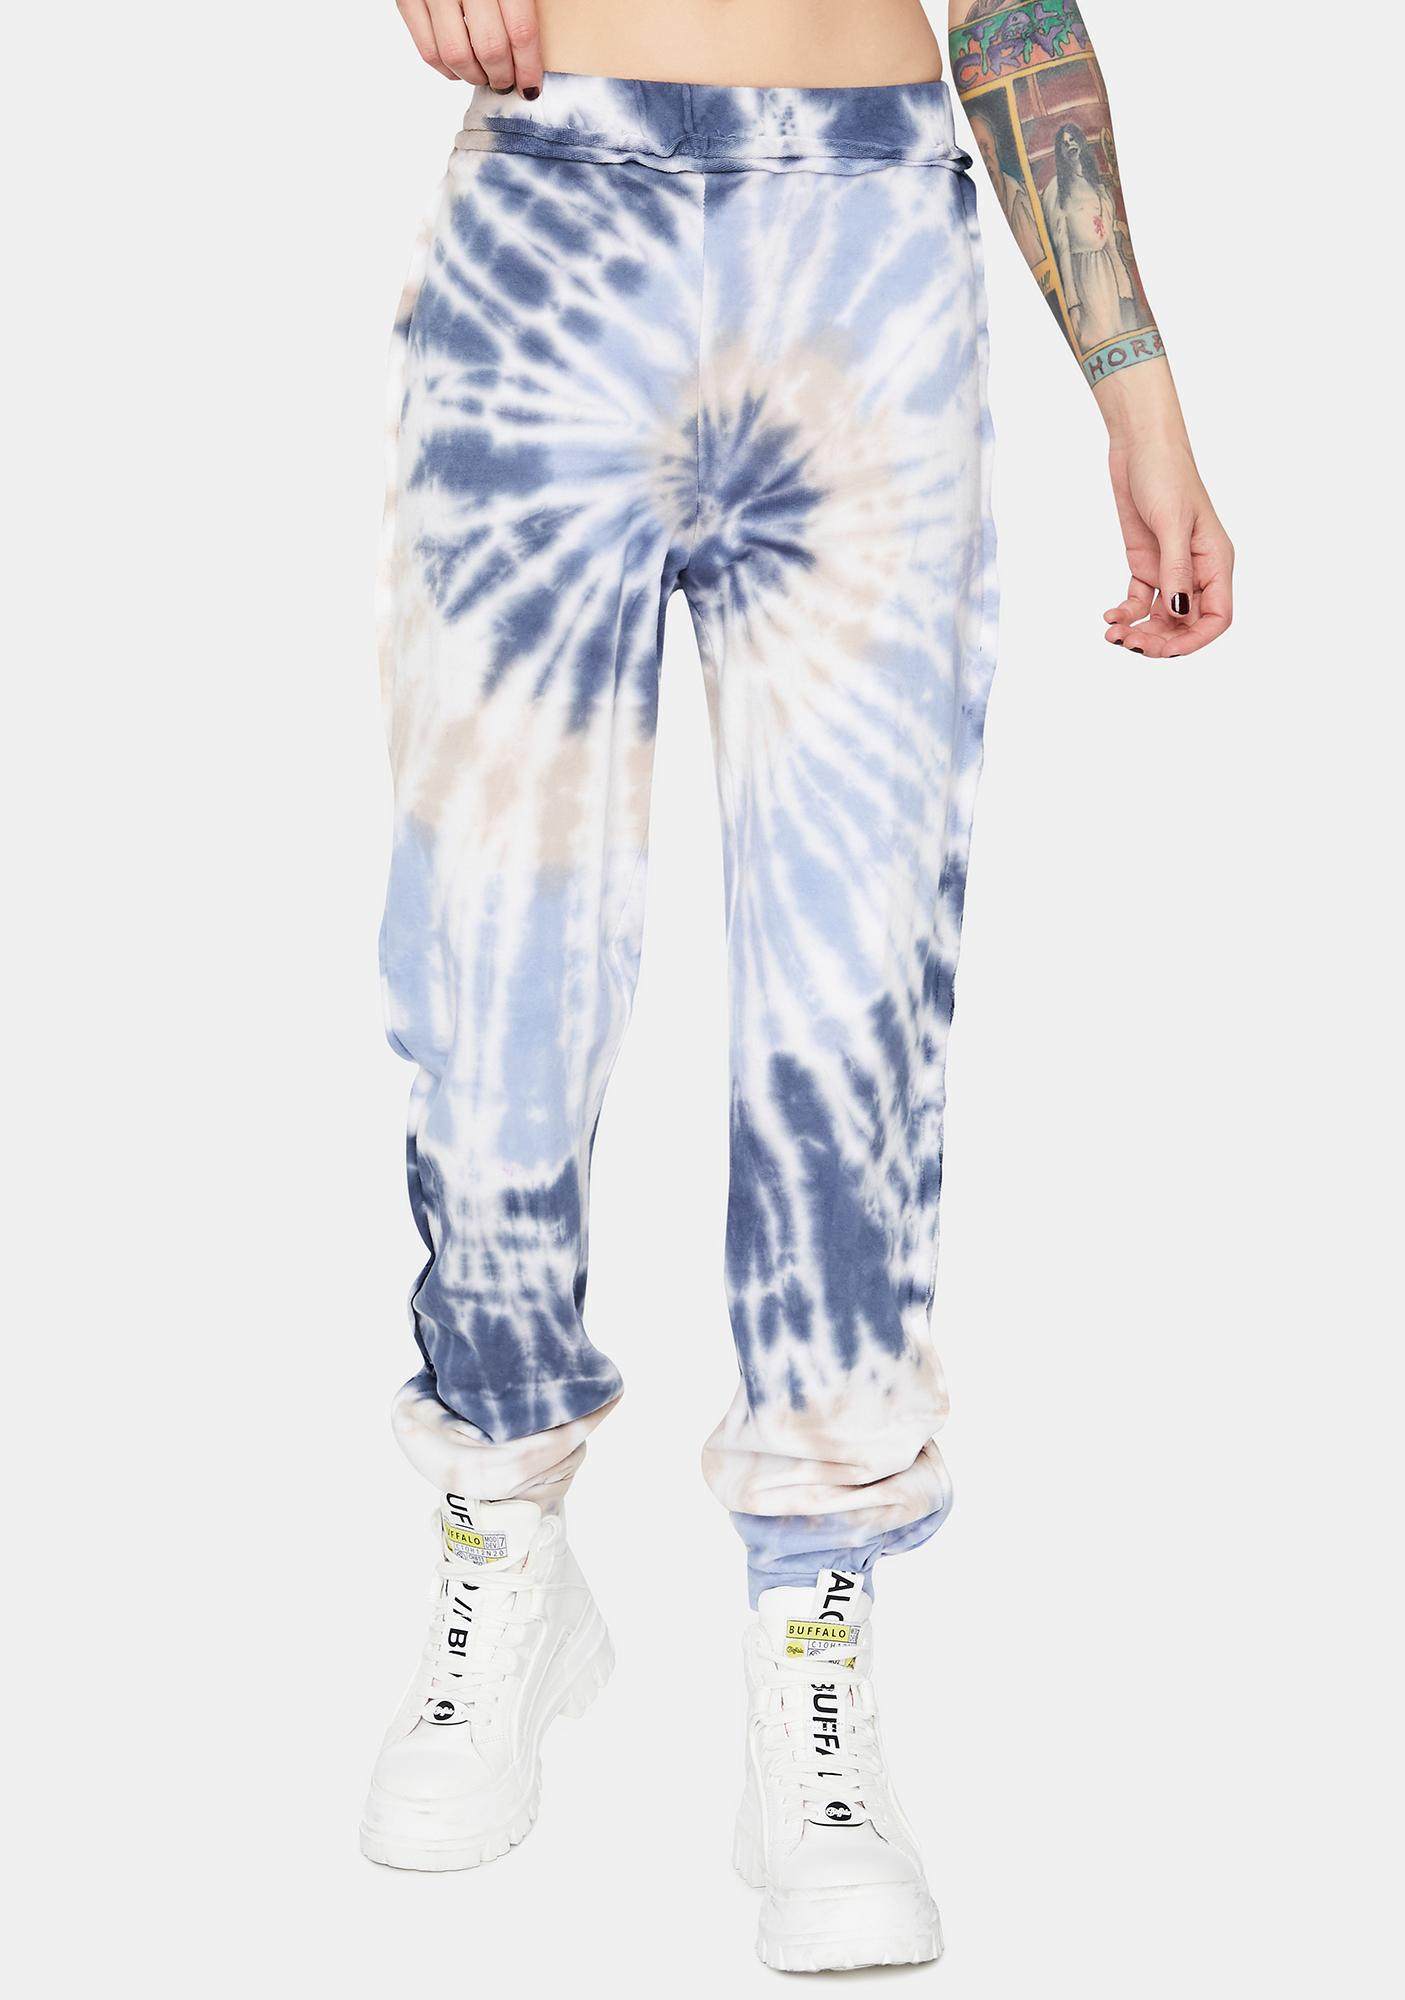 Groove Groupie Tie Dye Sweatpants